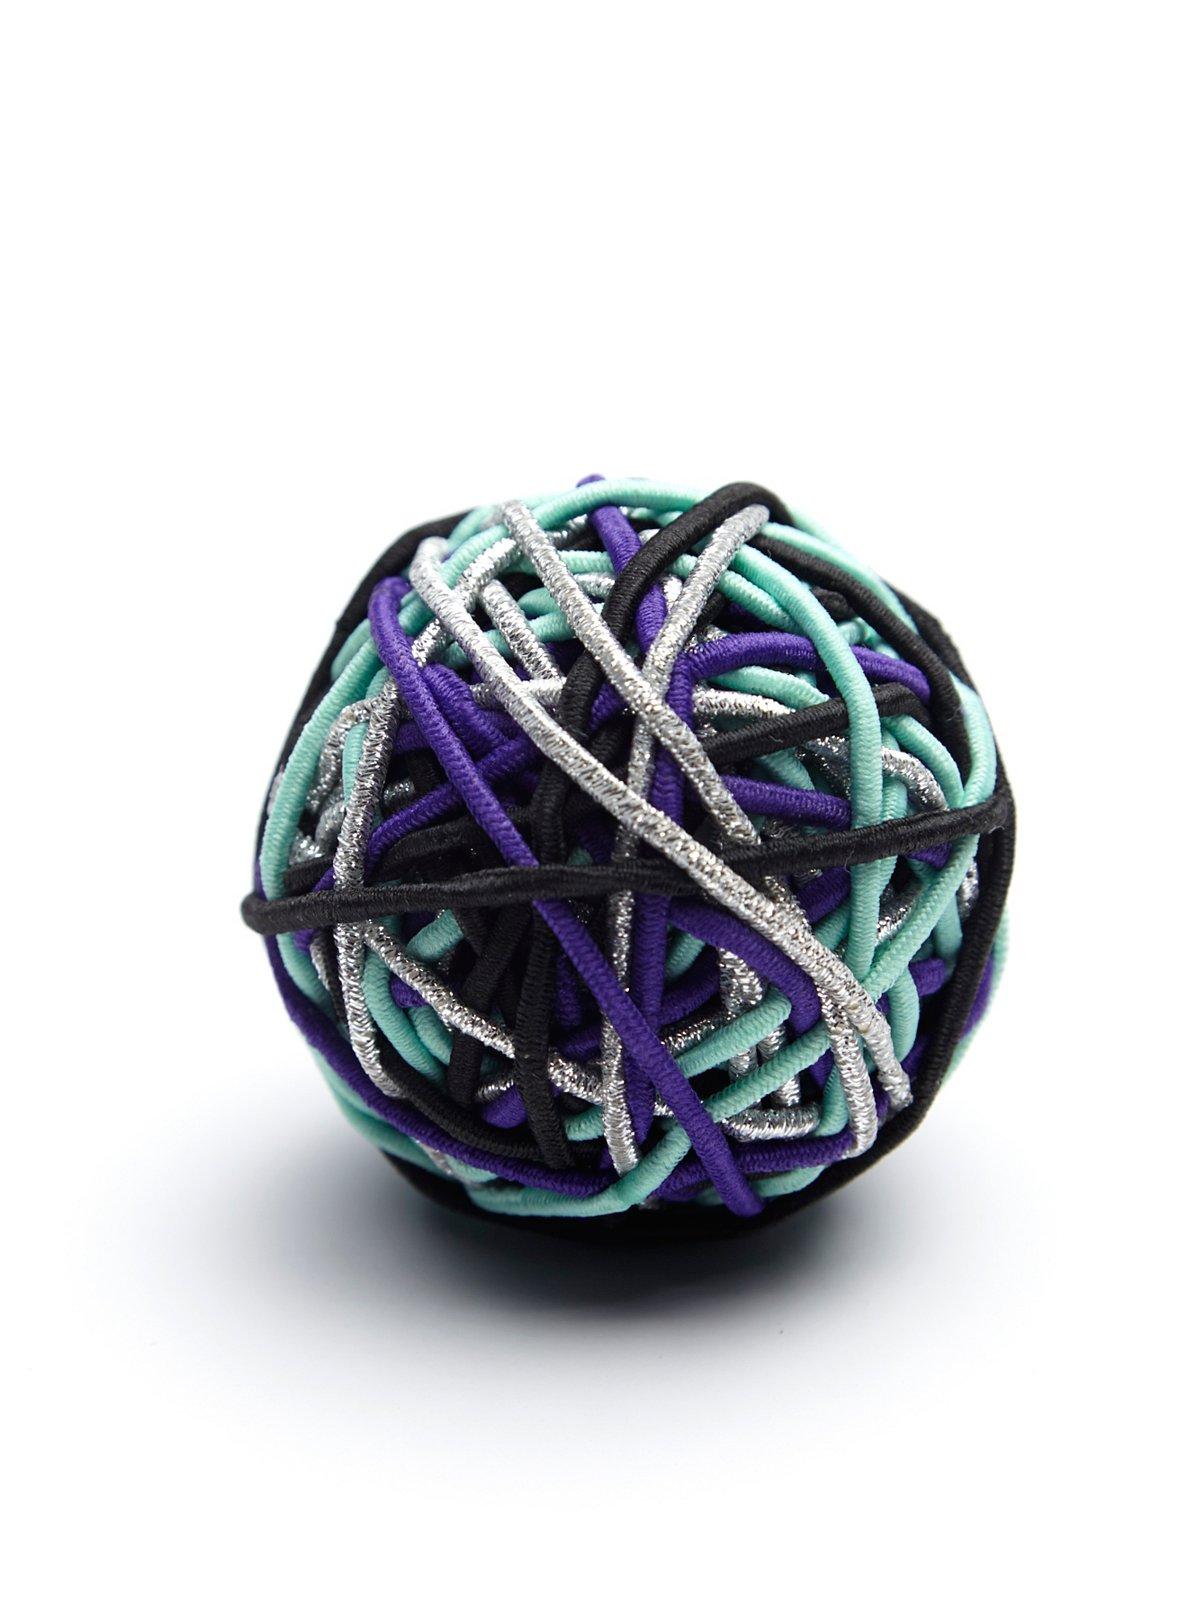 Infinity发绳球